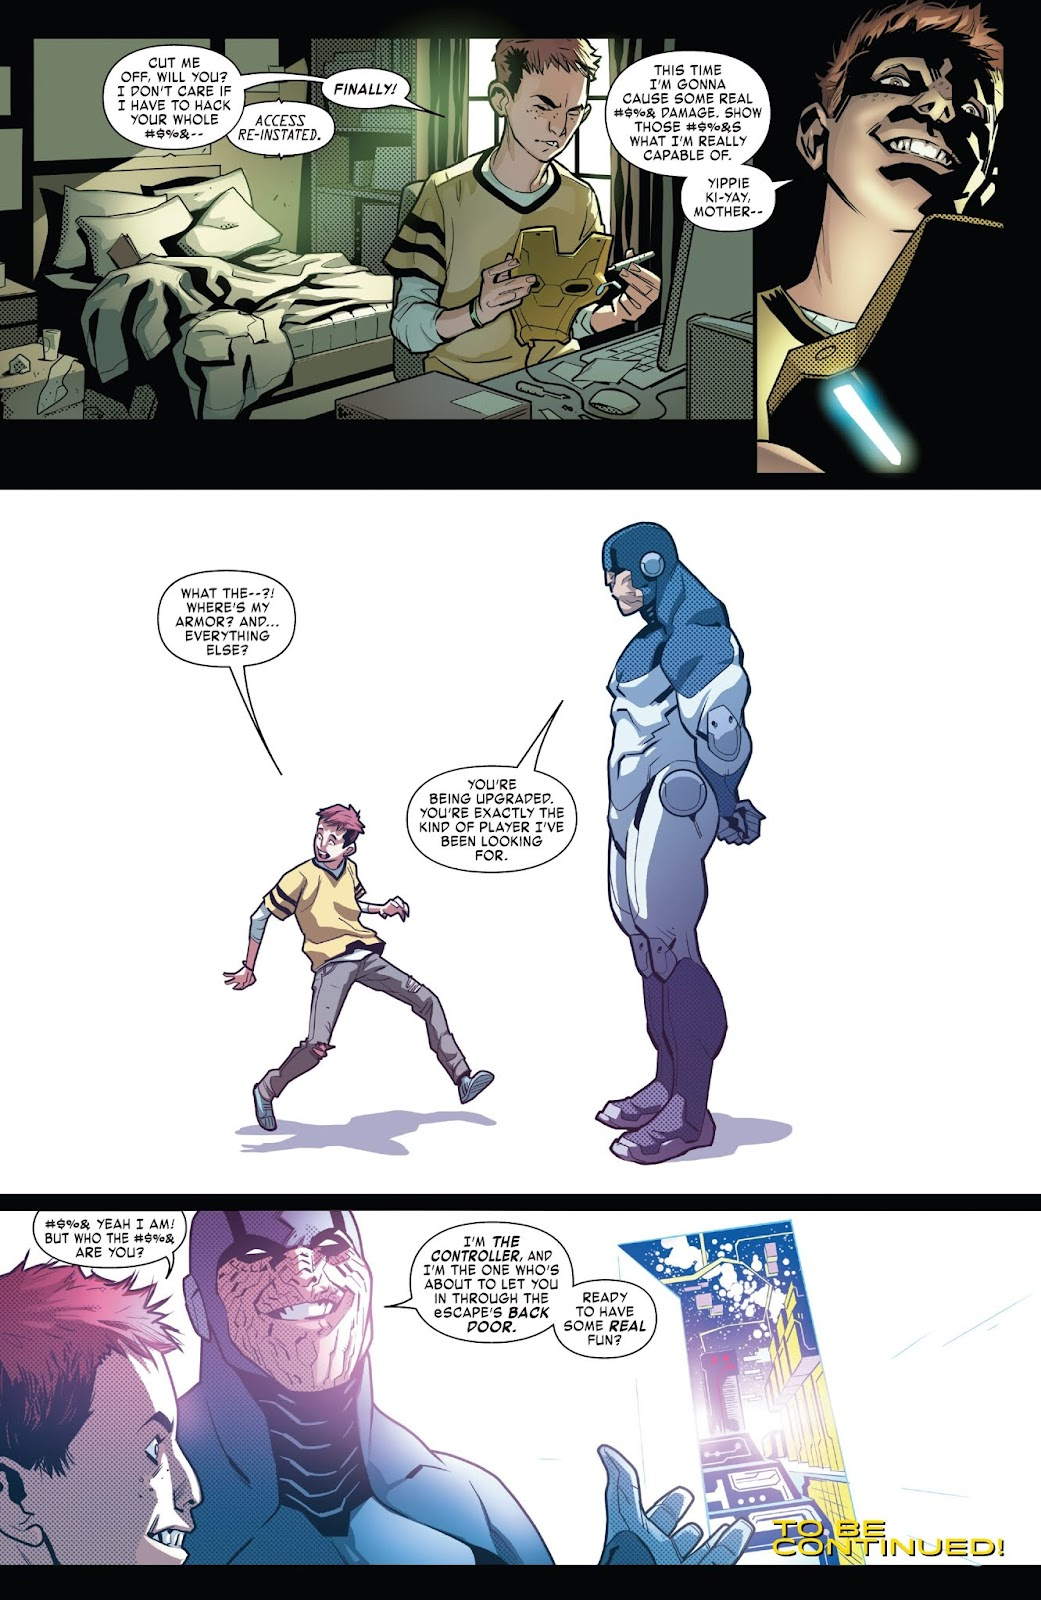 Read online Tony Stark: Iron Man comic -  Issue #6 - 21